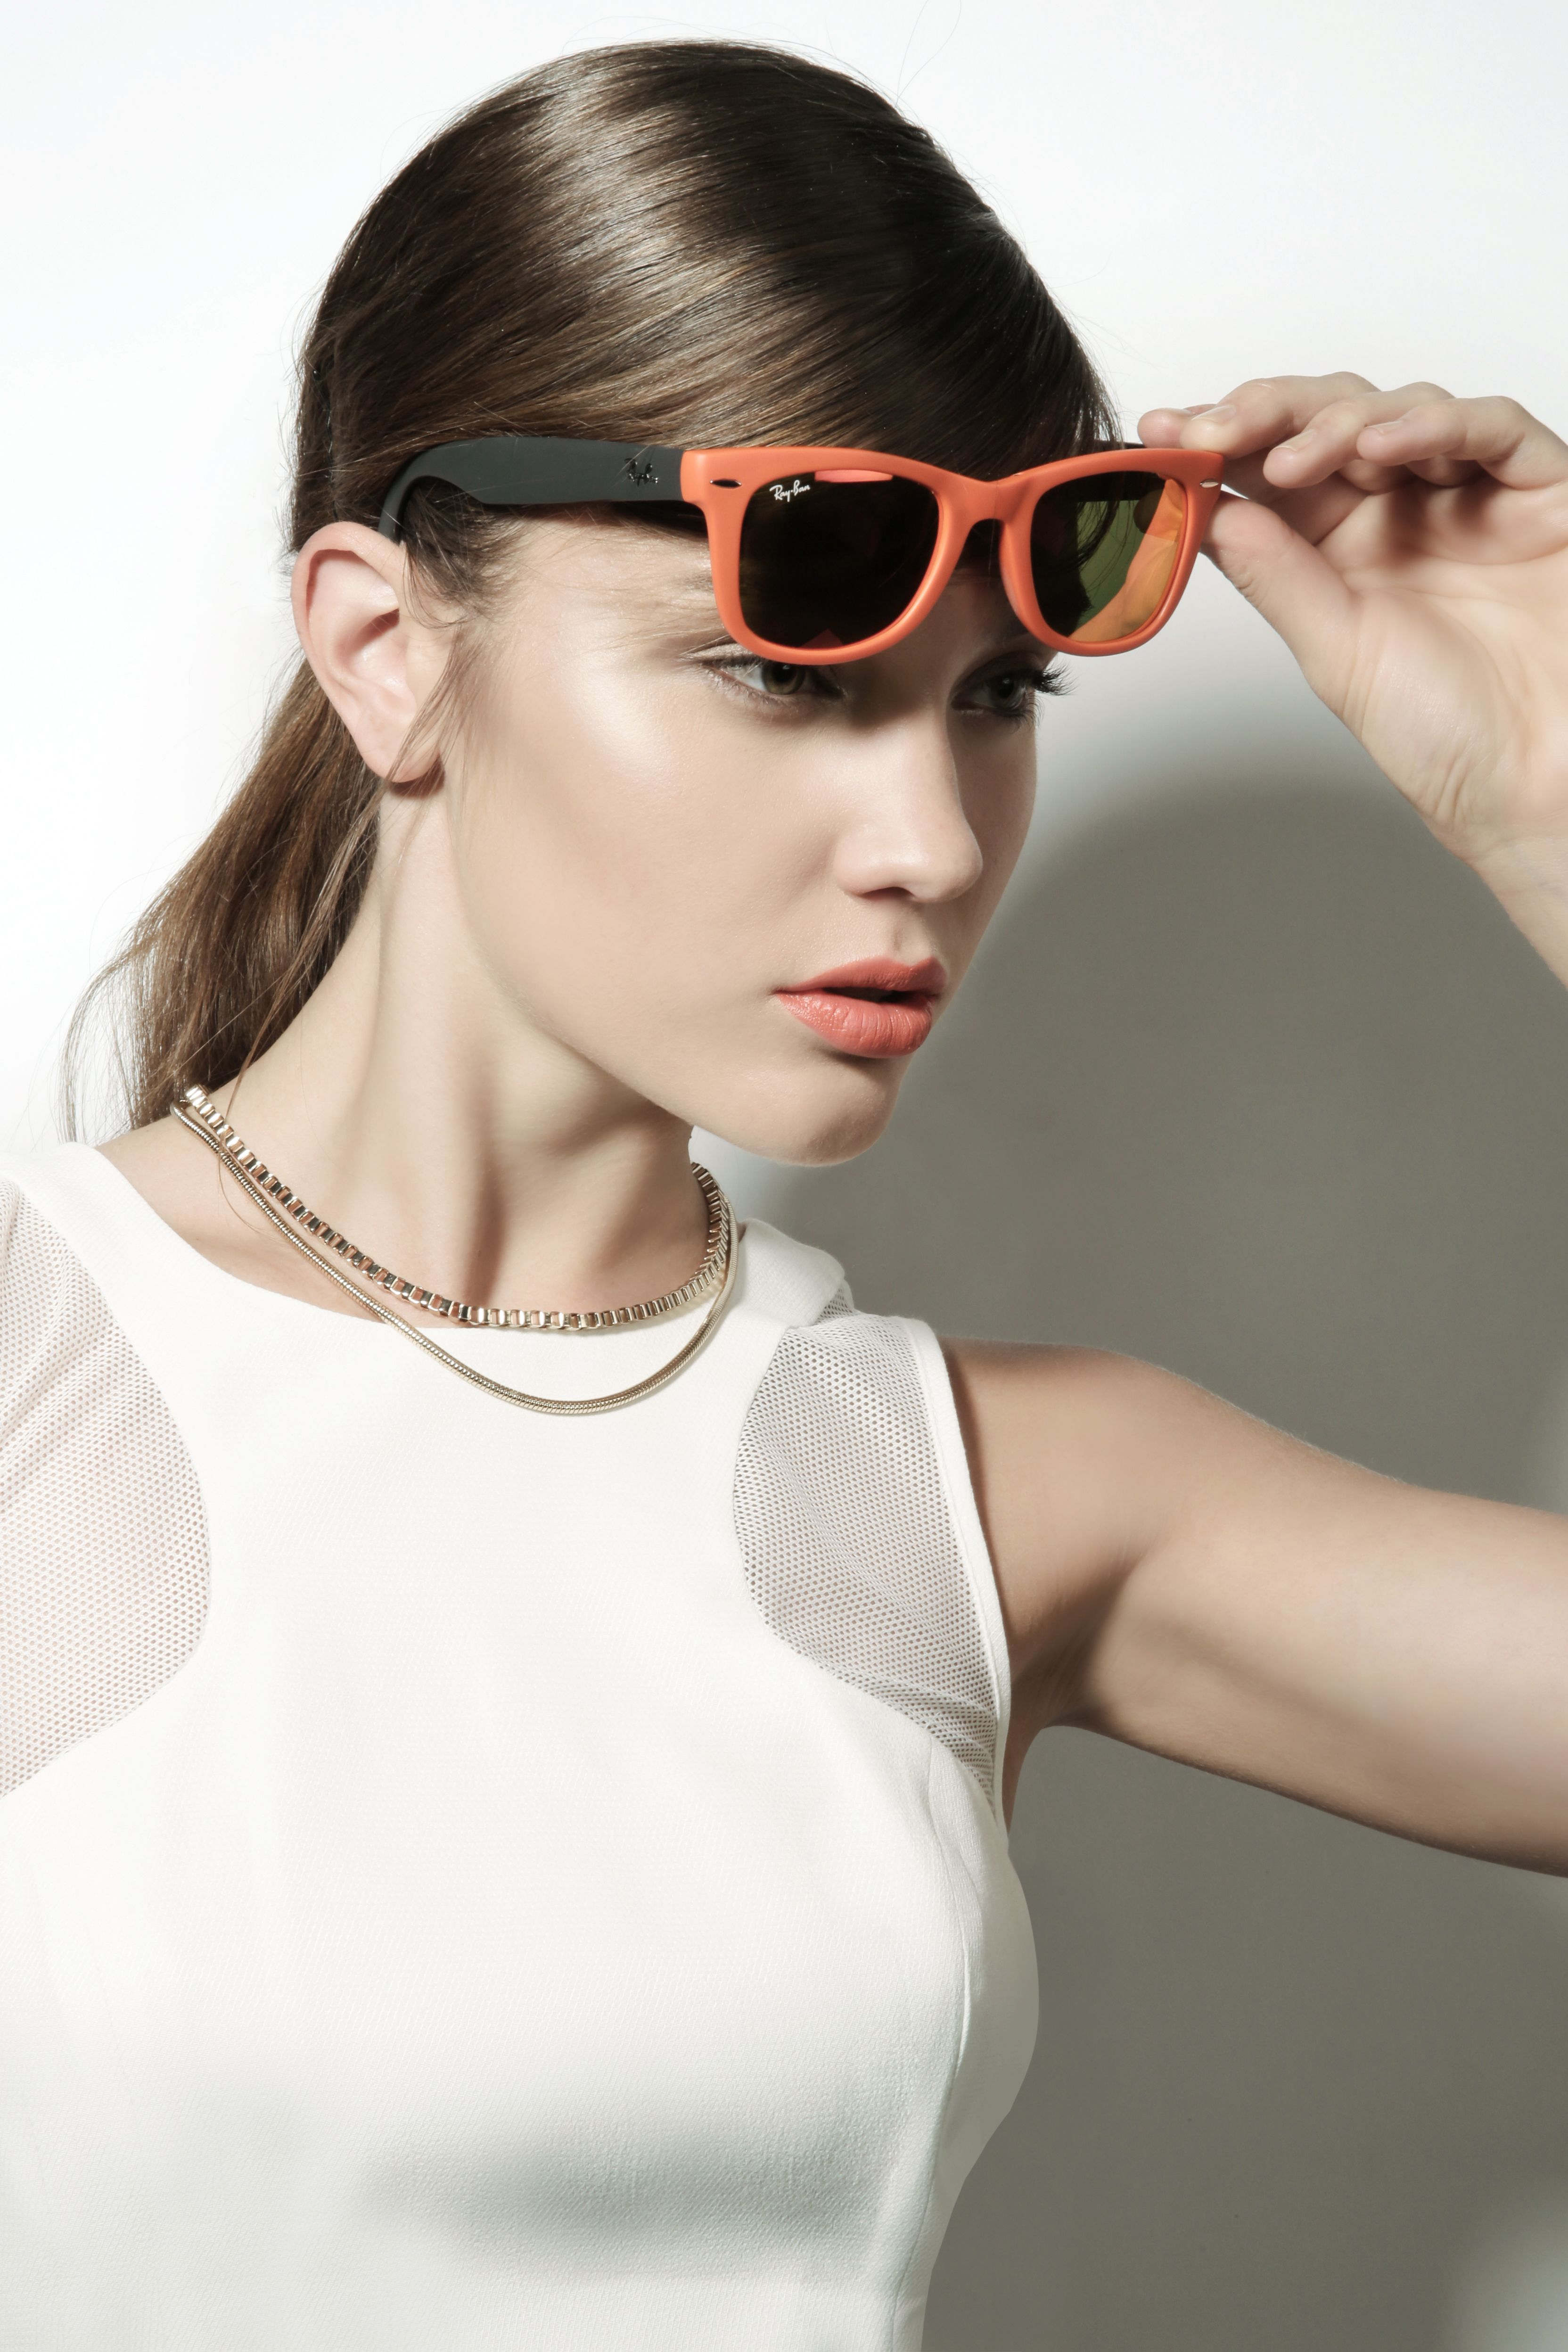 Boyner Sunglasses Trend Yaz Sun Cool Gozluk Turuncu Fashion Moda Style Attractive Mysterious Orange Elegant Gunes Summer Moda Trendler Gozluk